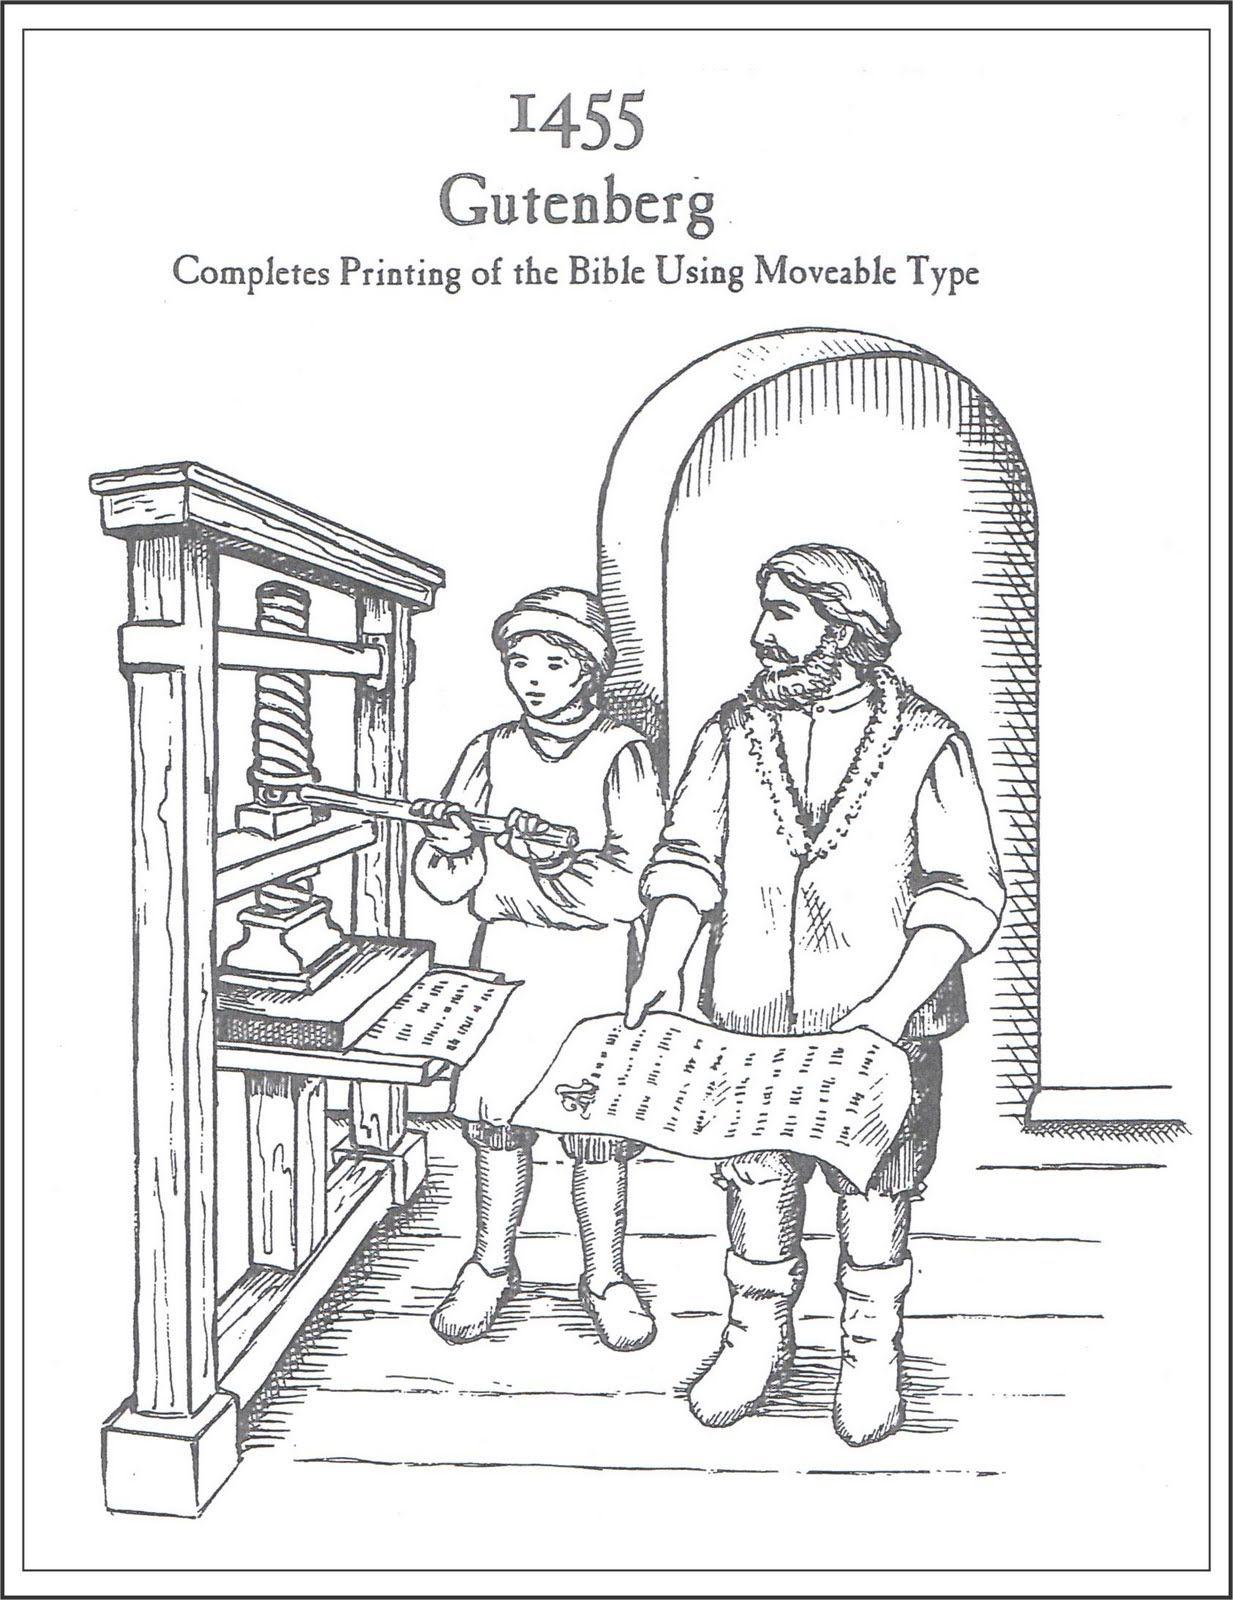 Mrs  Jordan's History Class: Gutenberg's Printing Press